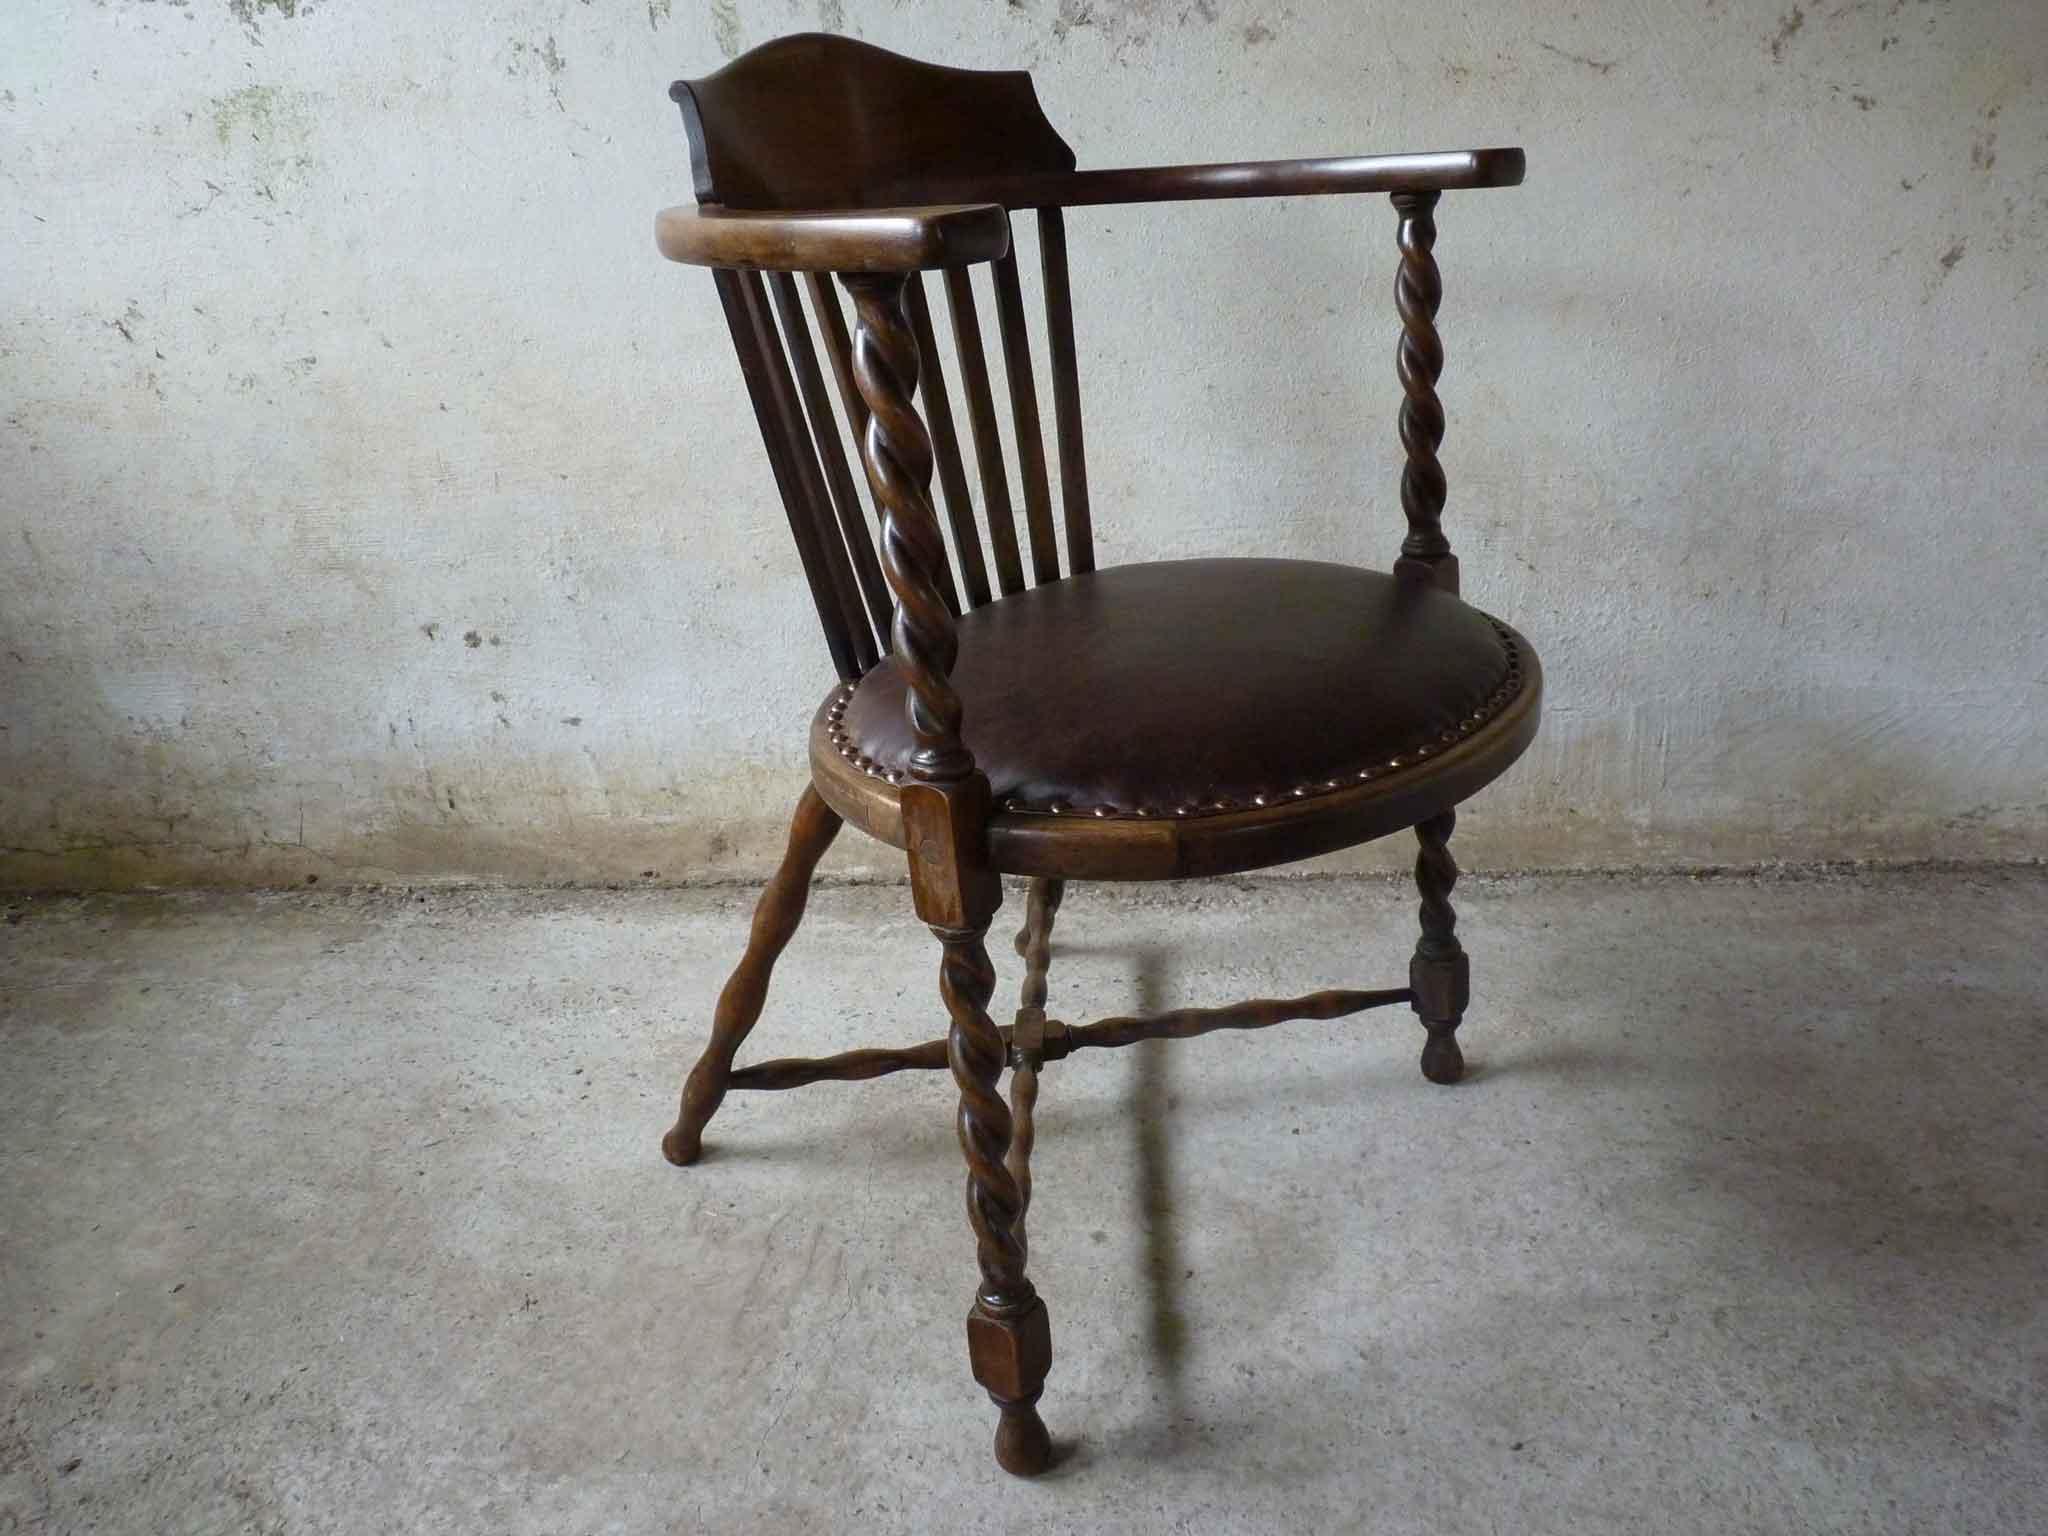 An unusually designed barley twist antique chair